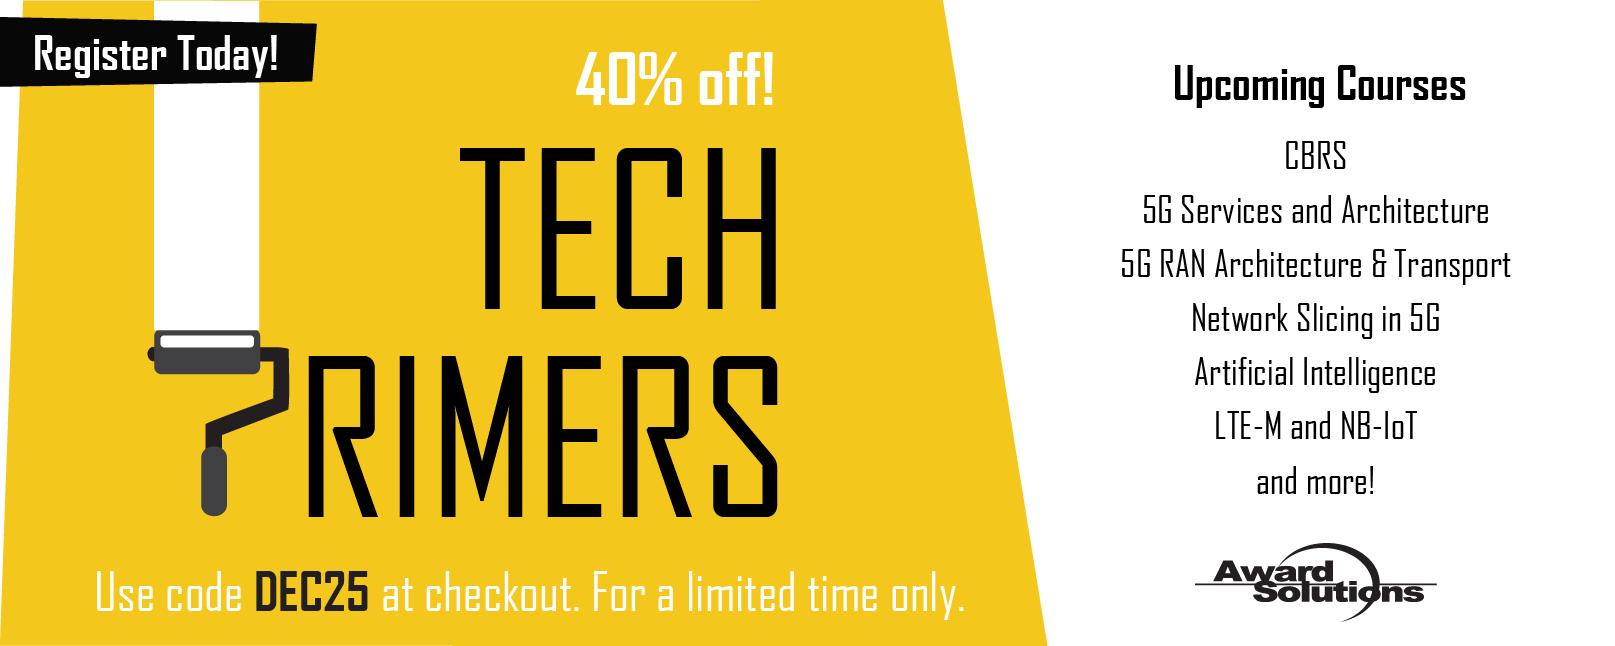 Tech Primers Americas Dec 2019 Website 775 x 310-01.jpg